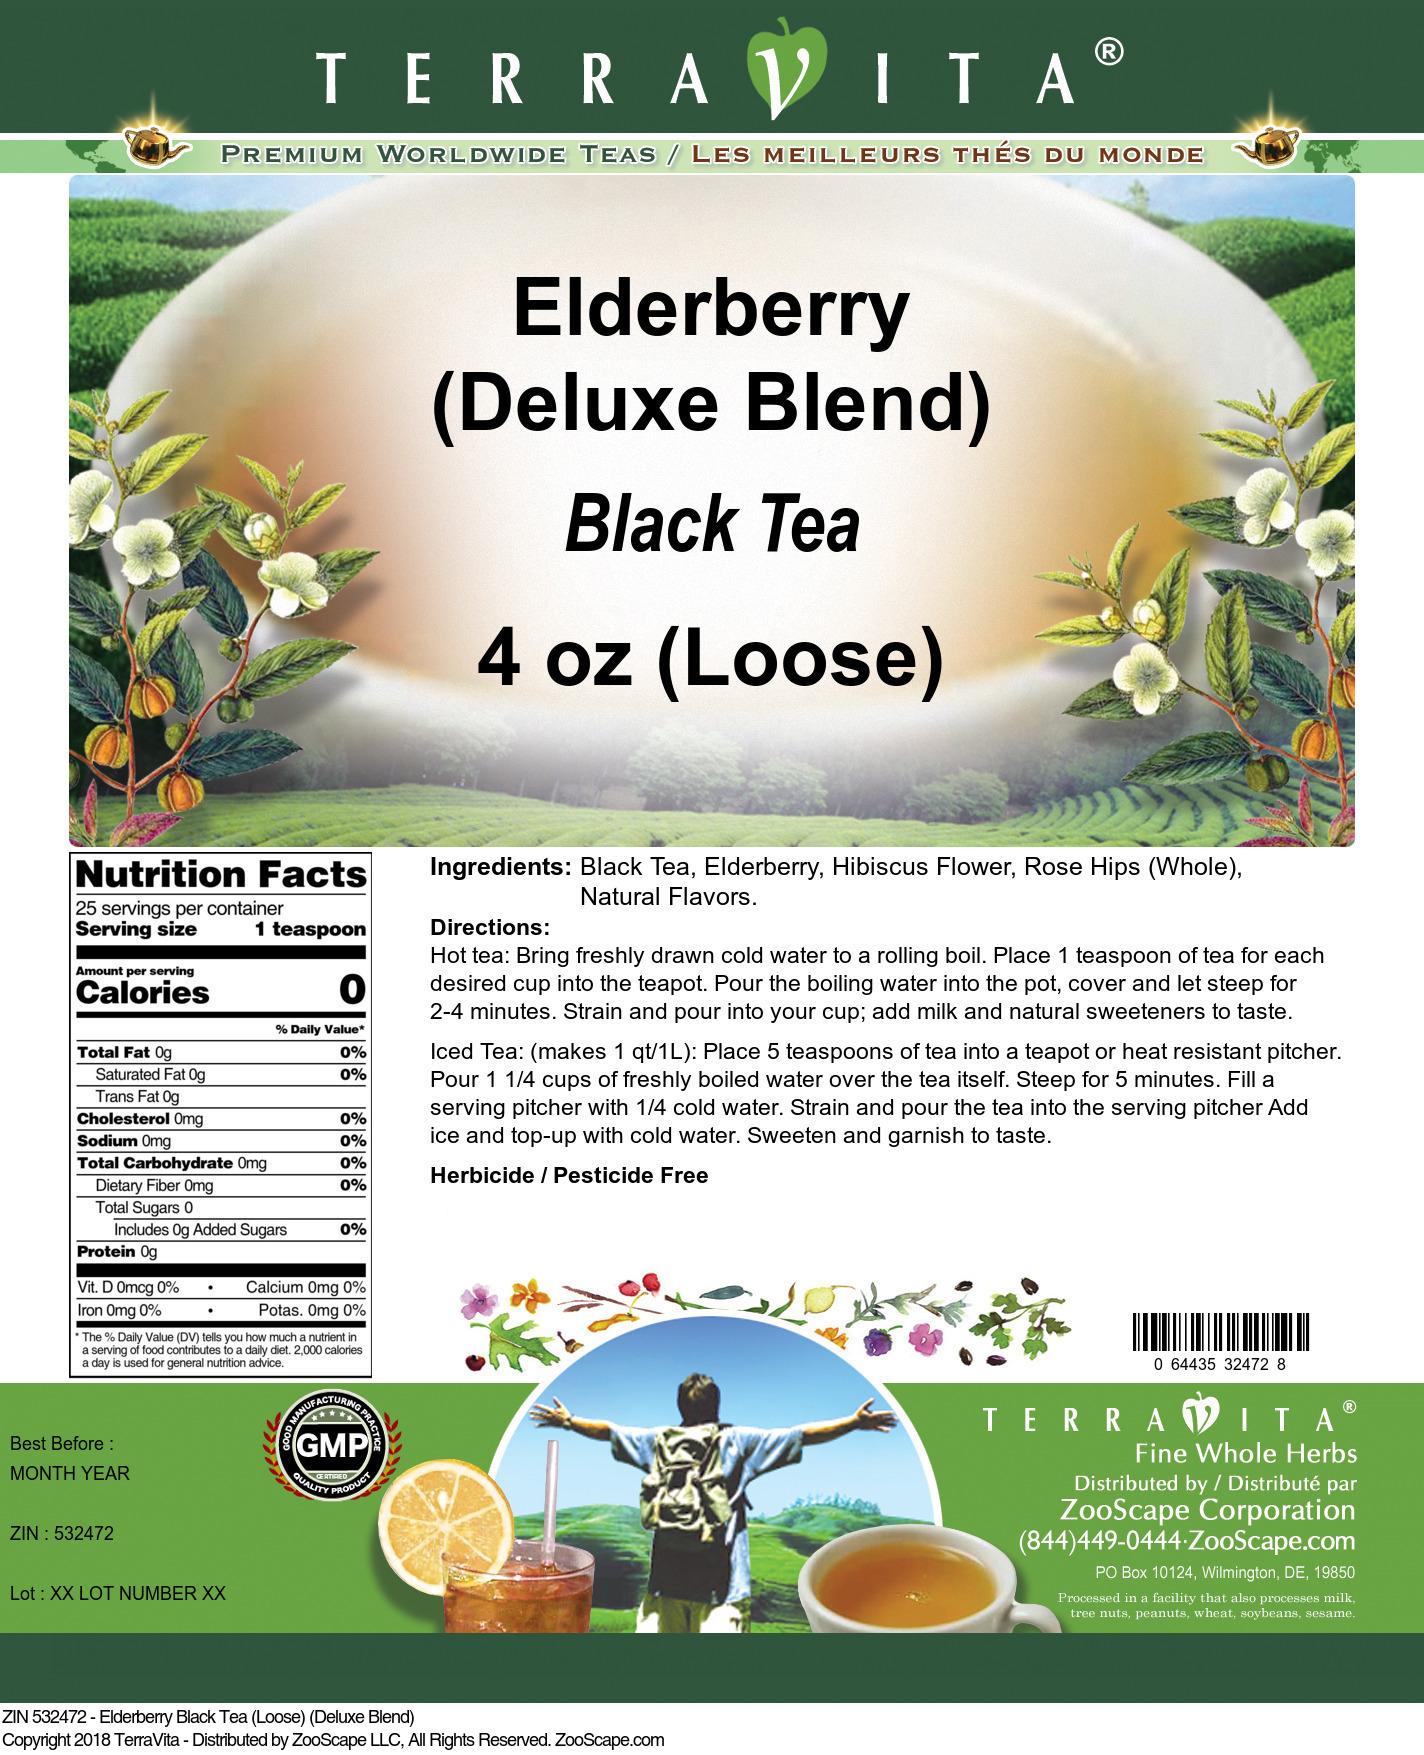 Elderberry Black Tea